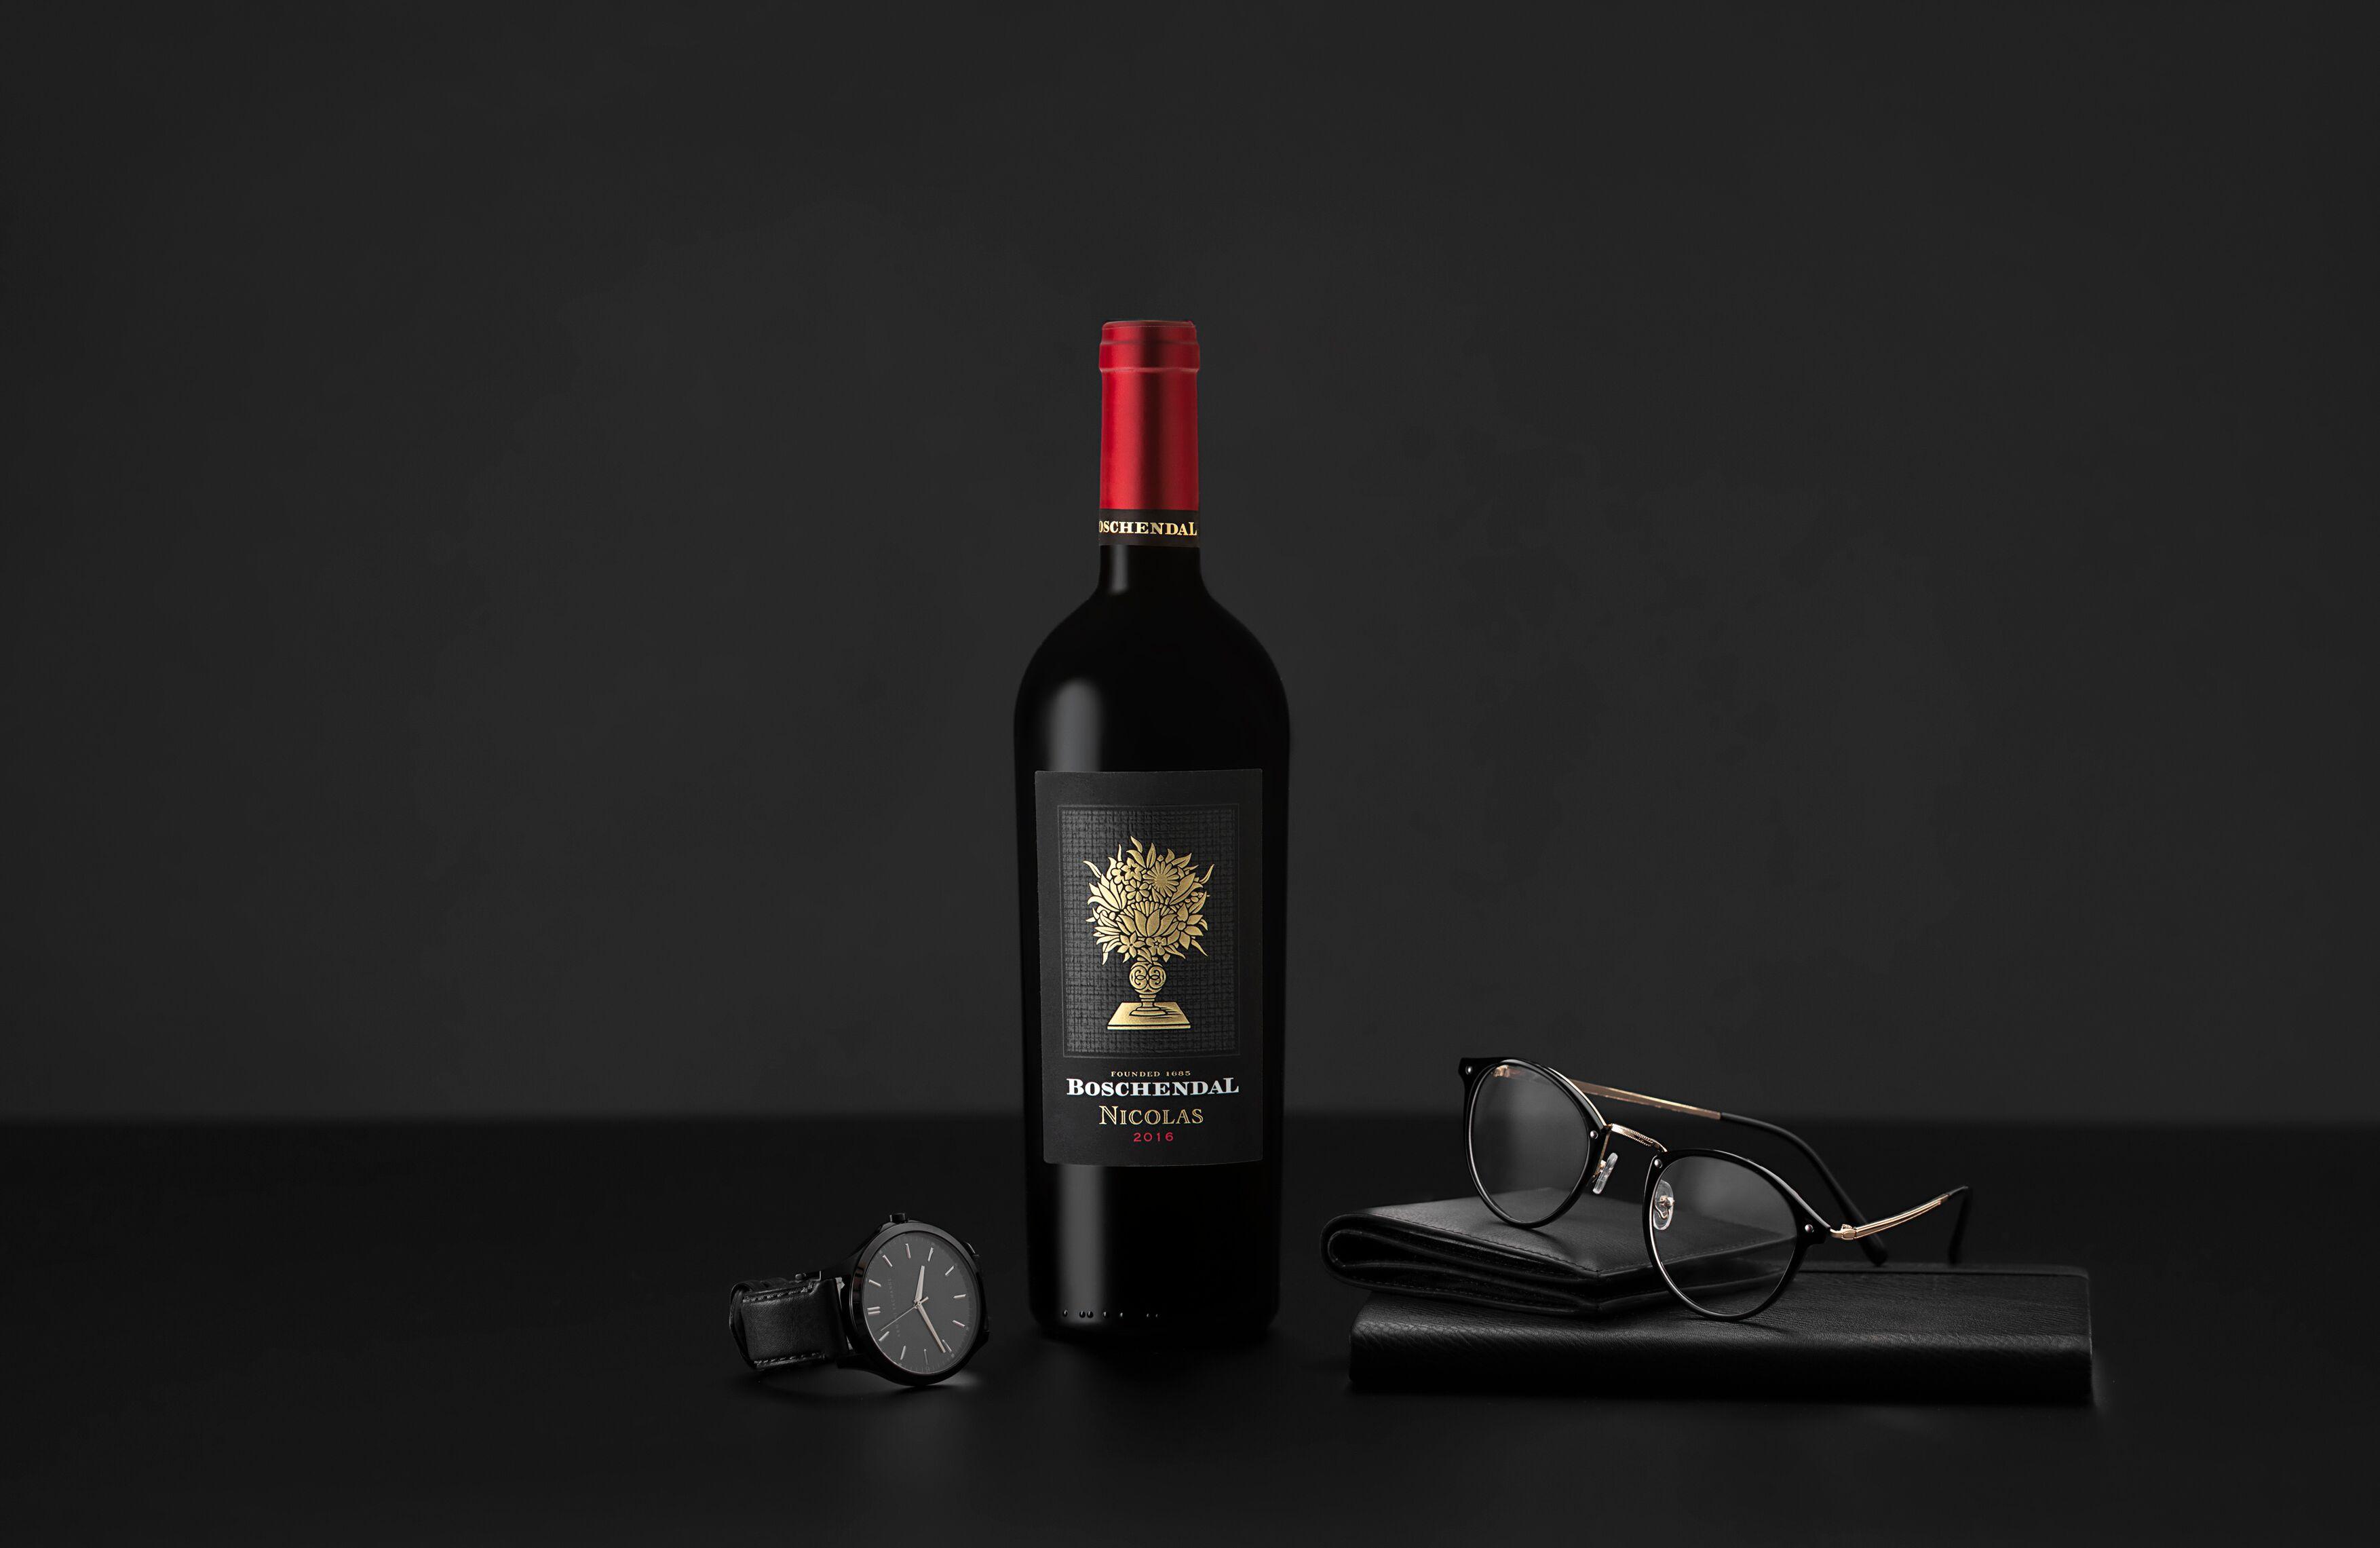 Boschendal Presents Nicolas: An Expressive, Distinctive Red Blend photo